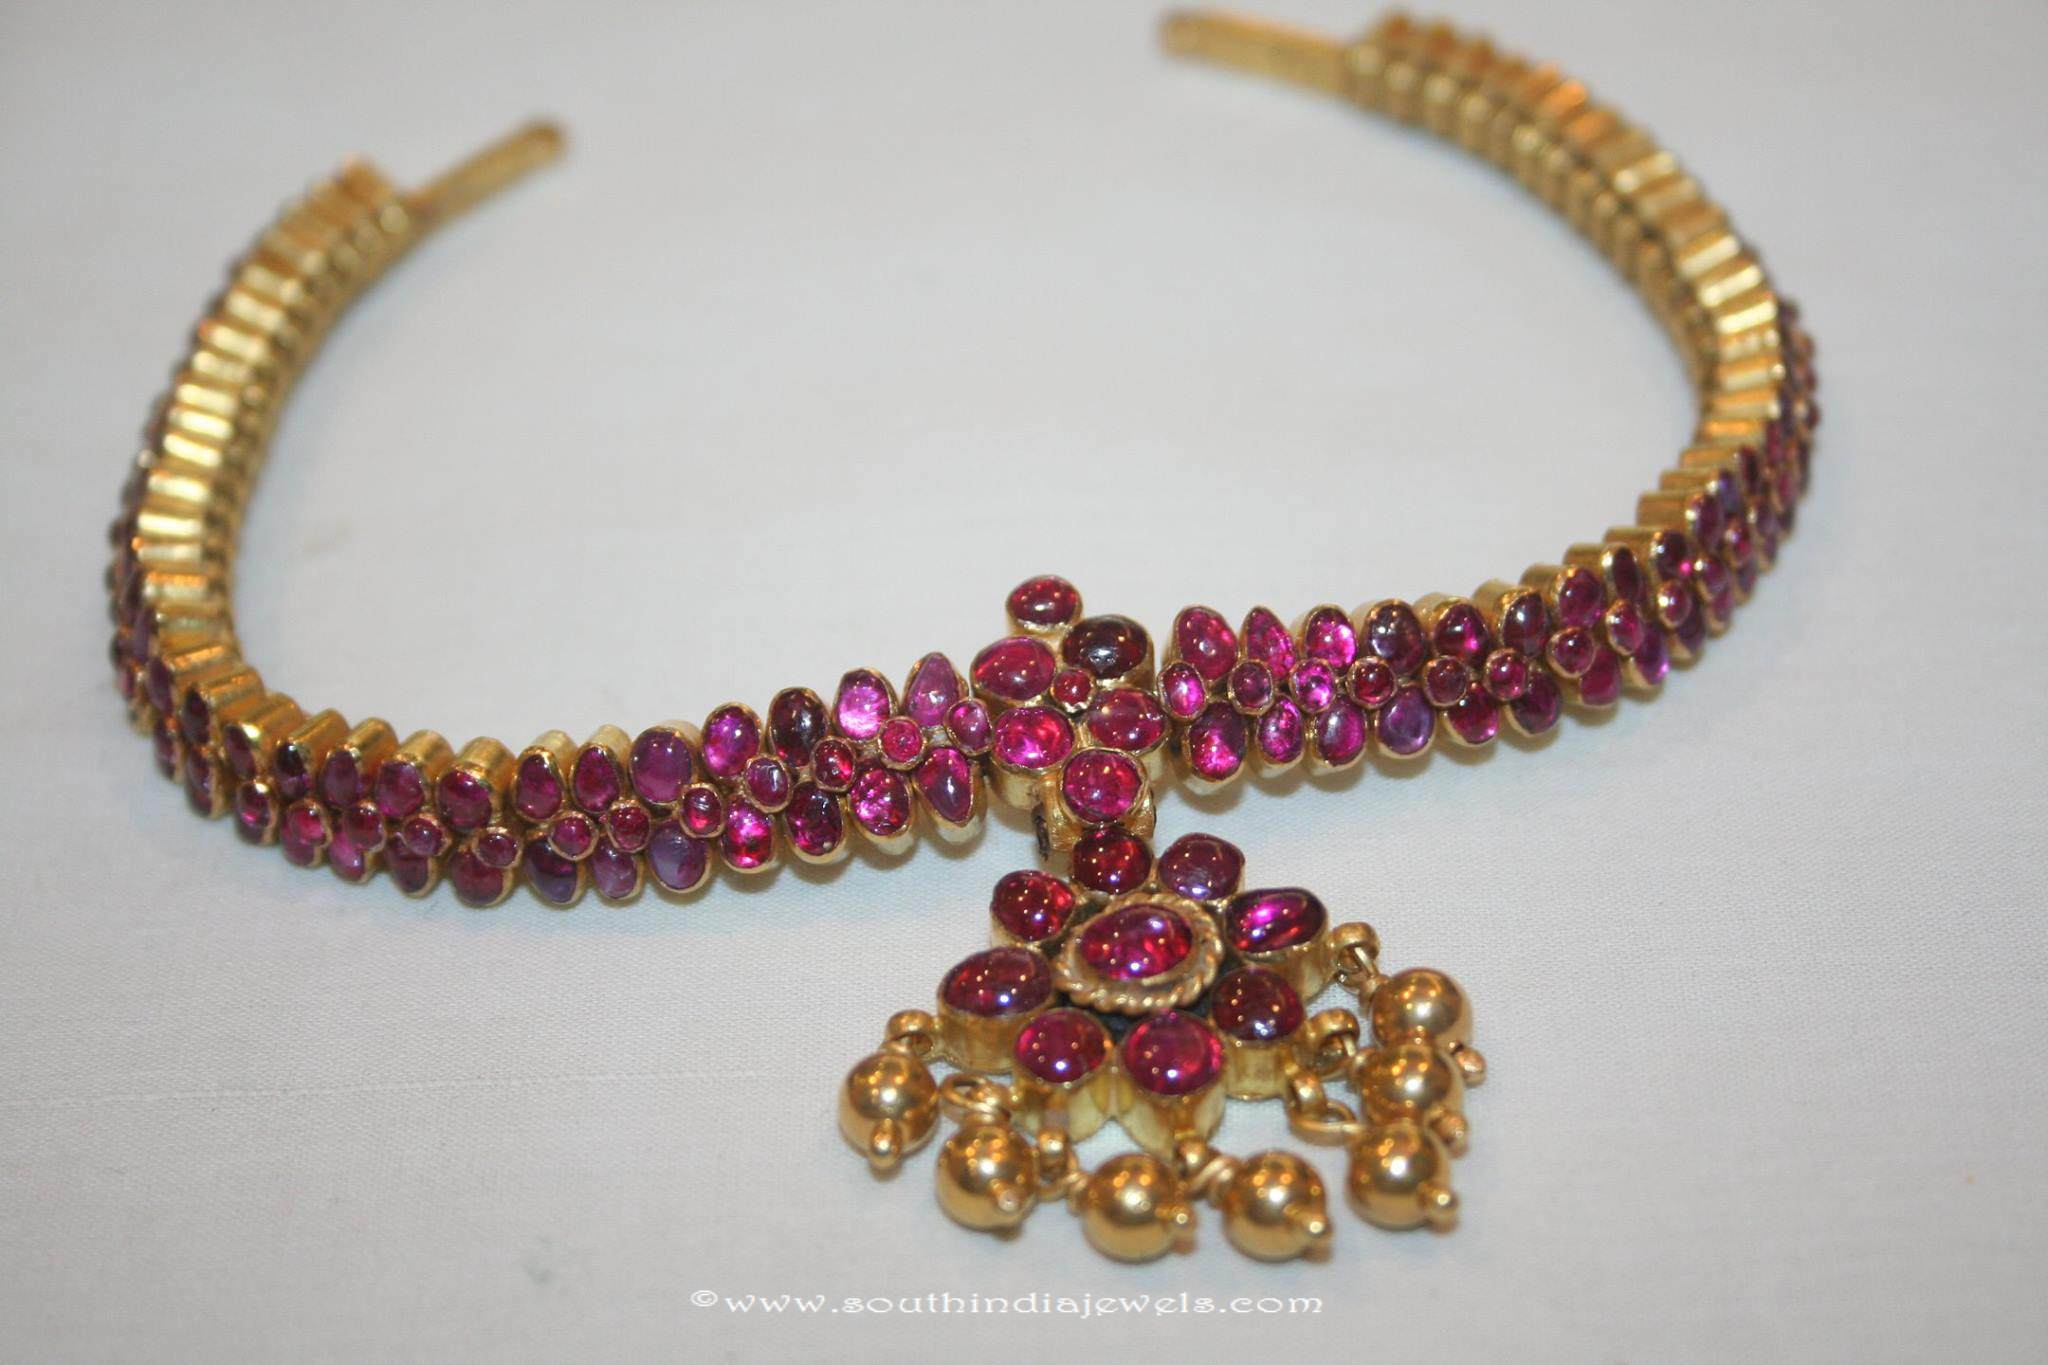 d5e4b3f27 Gold ruby attigai prakurthi. 22k Necklace Designs necklaces htmlBuy online  ...